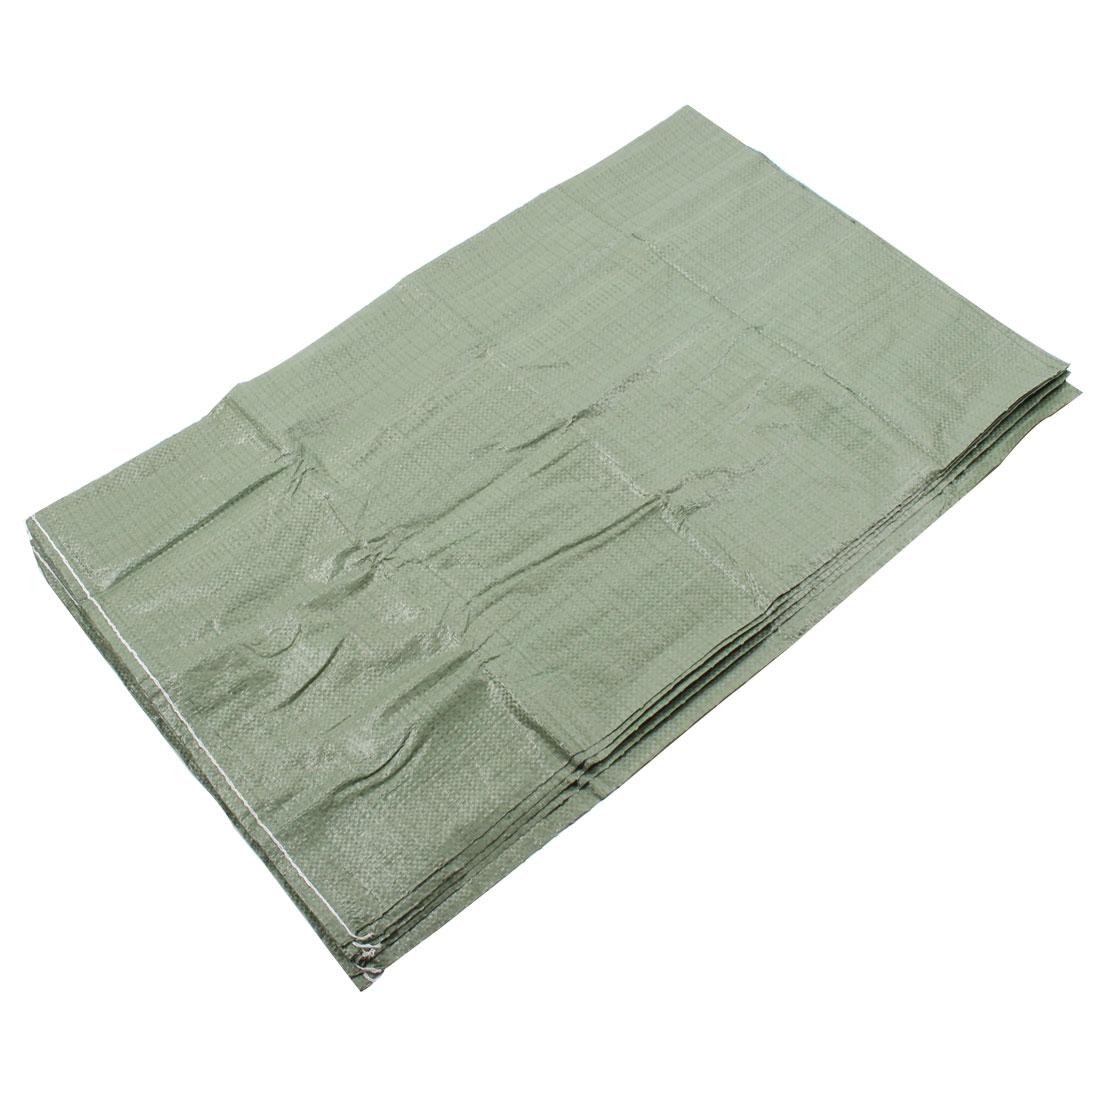 Building Logistics Express Plastic Cargo Packing Snakeskin Bag 100 x 60cm 5pcs